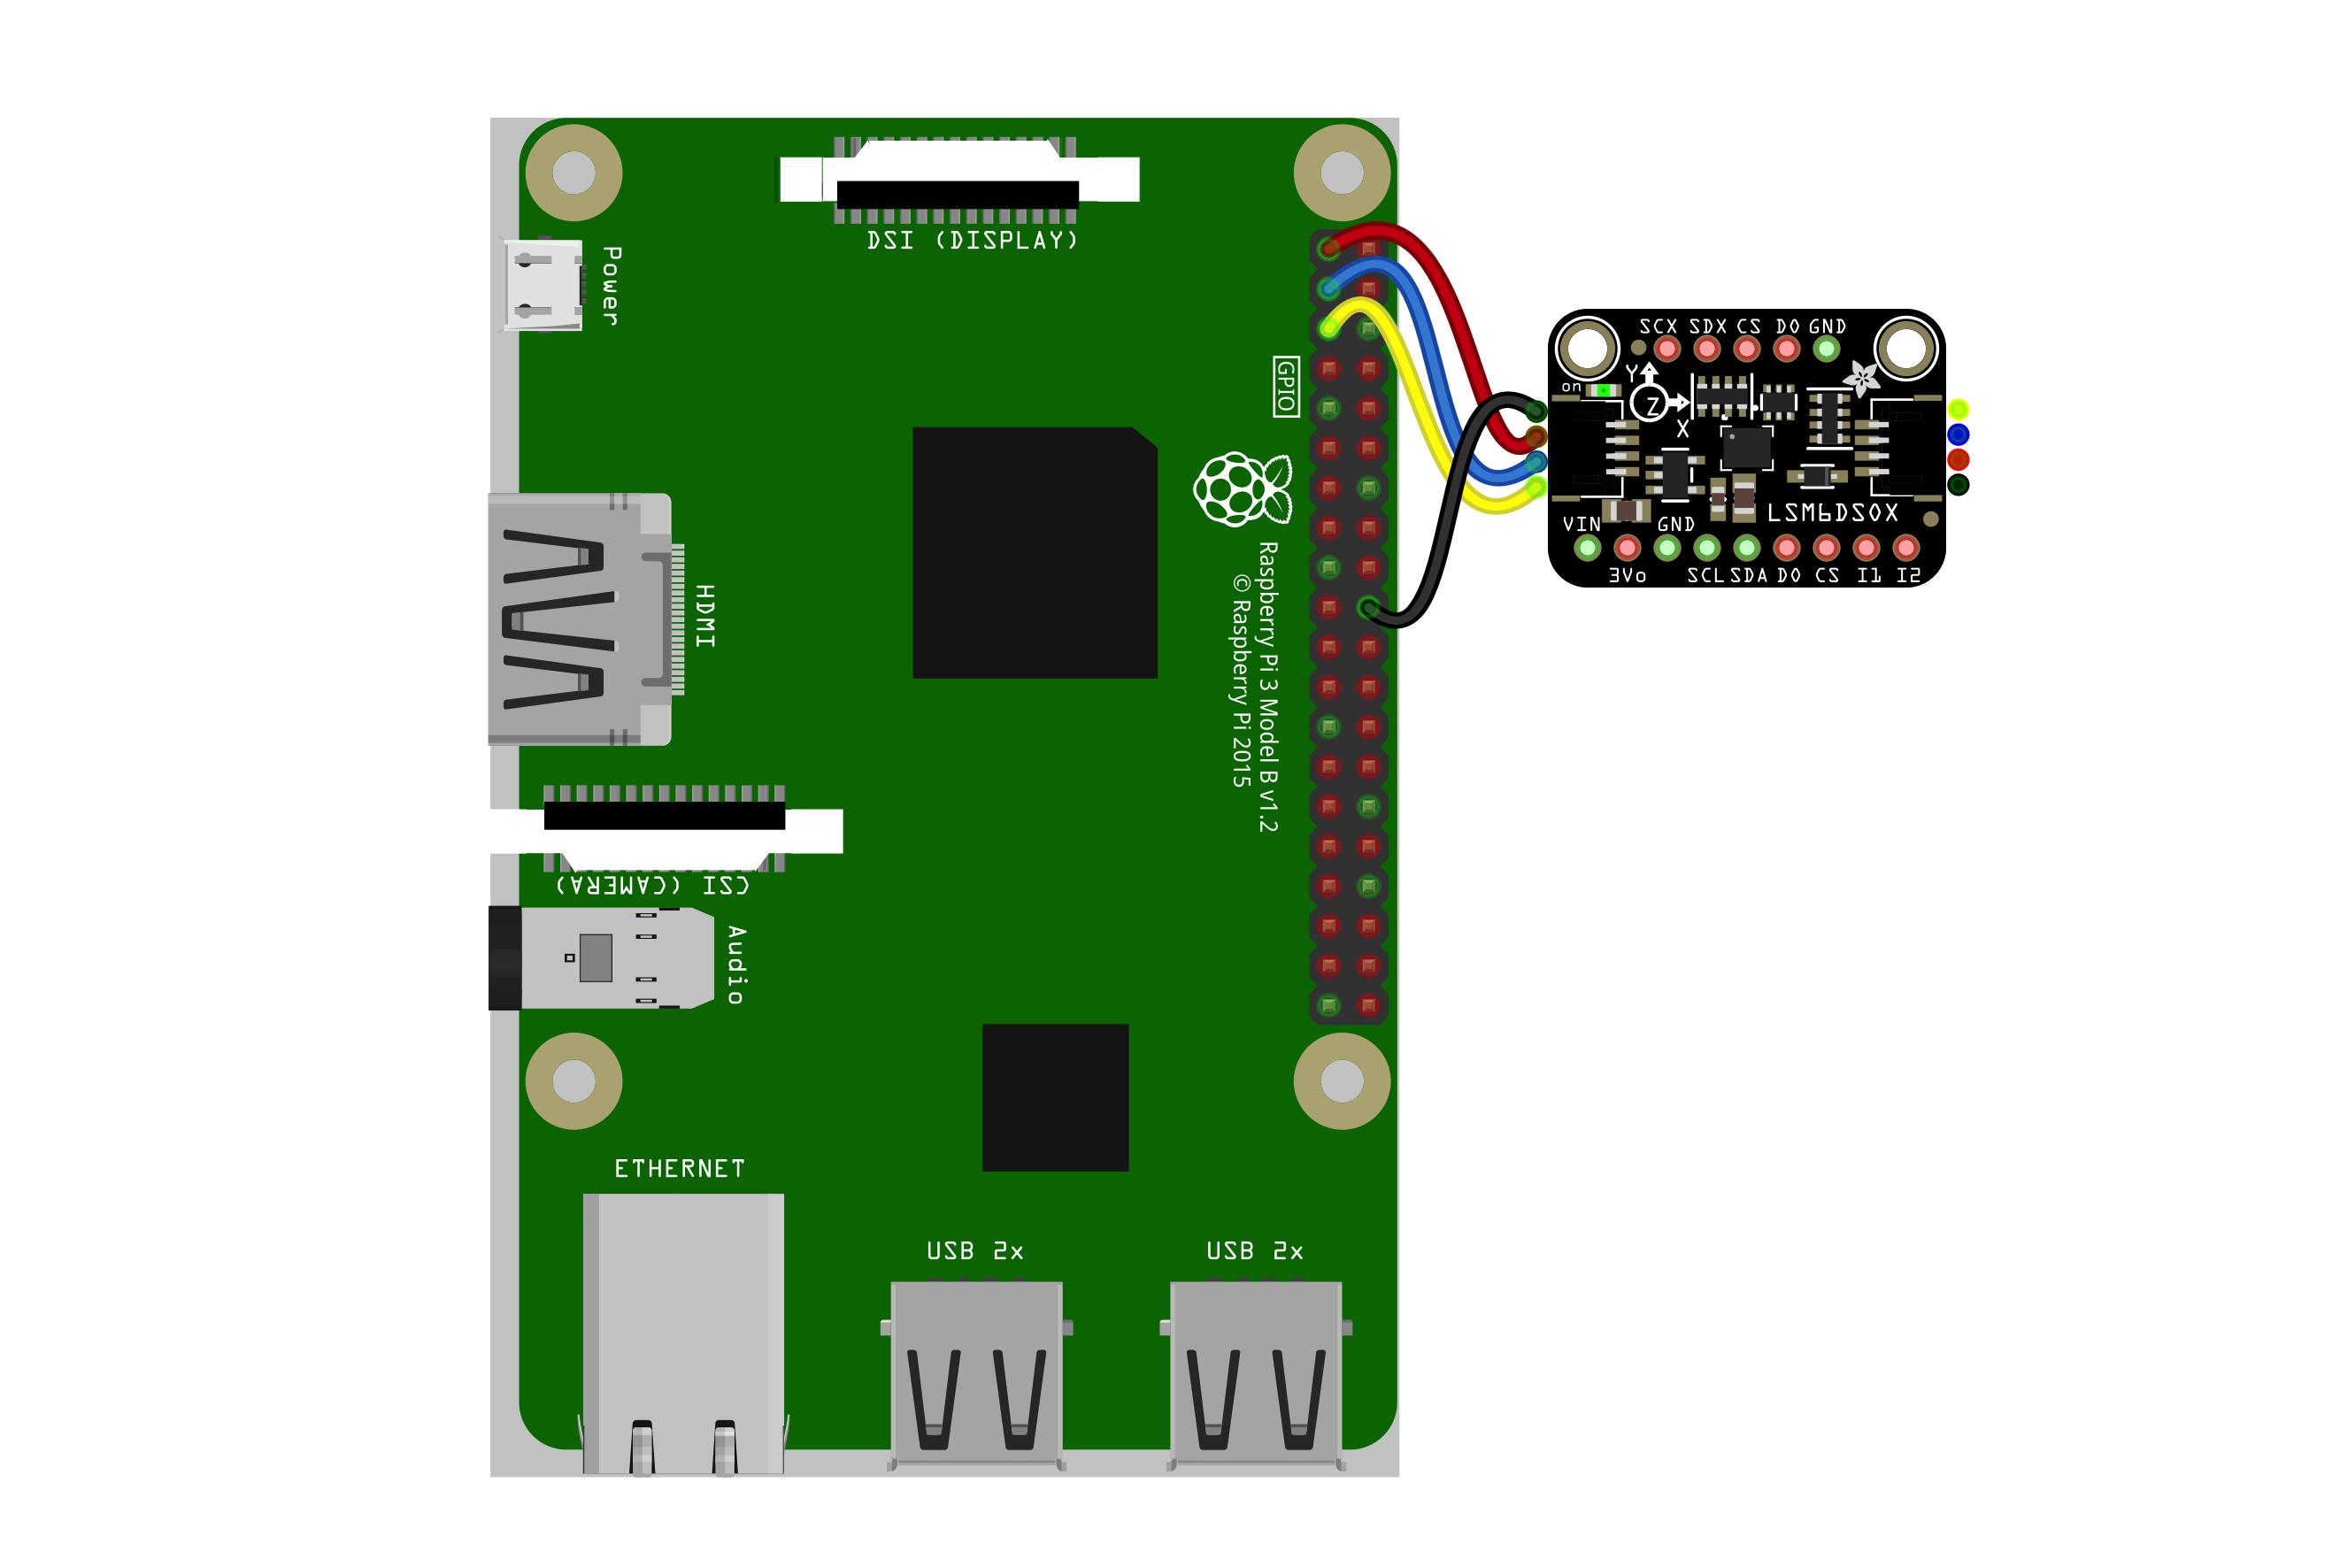 sensors_rpi_wiring_qt.png